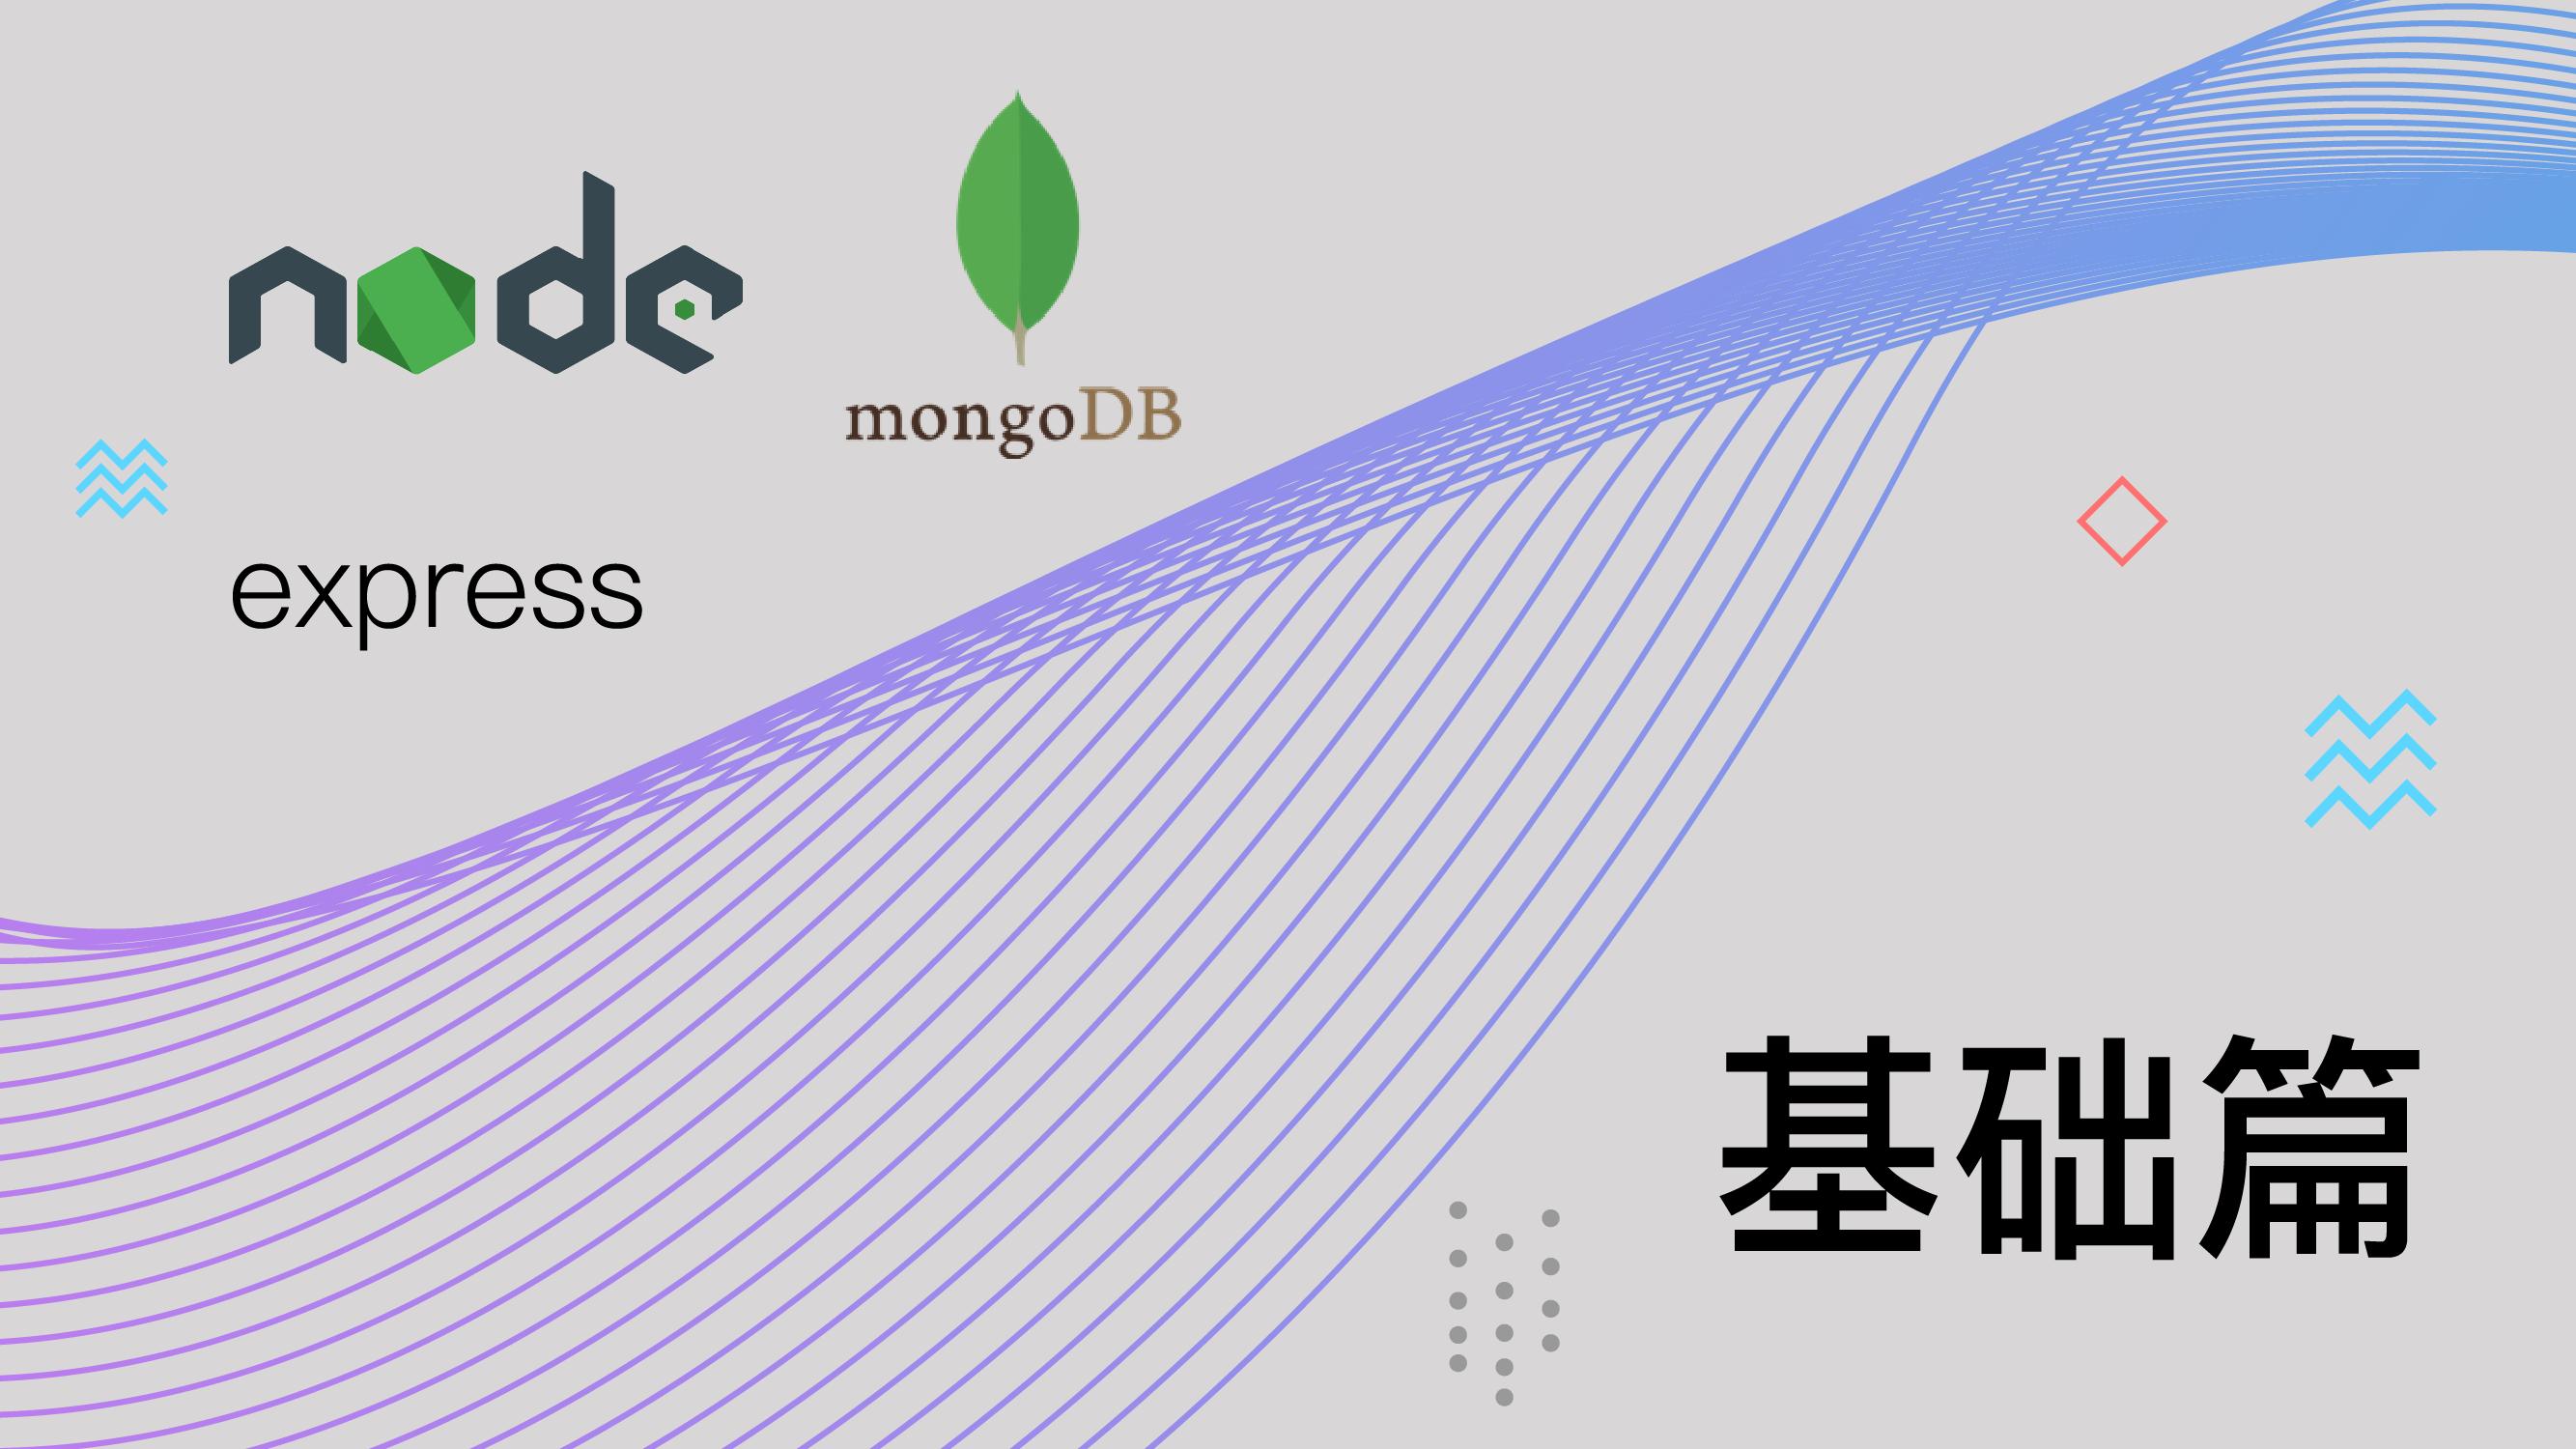 Nodejs + Express + MongoDB 基础篇视频教程